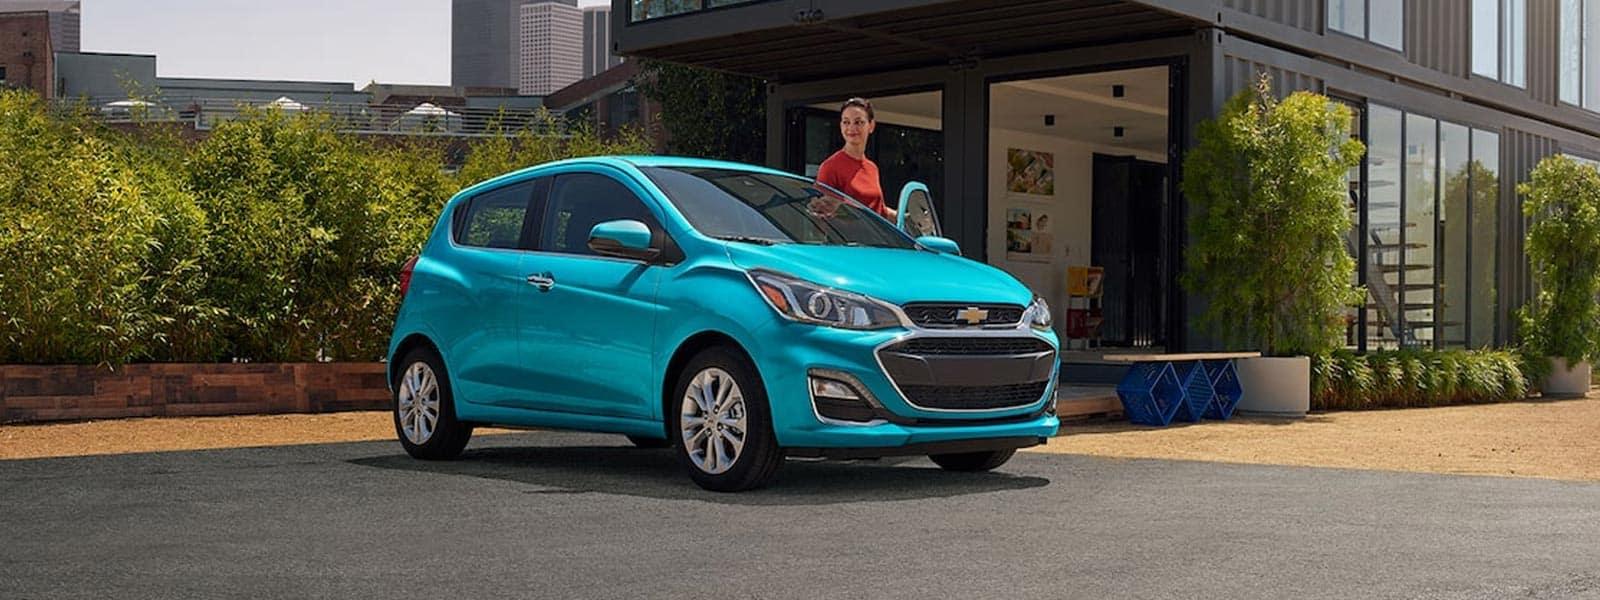 Buy 2021 Chevrolet Spark in Weyburn Saskatchewan